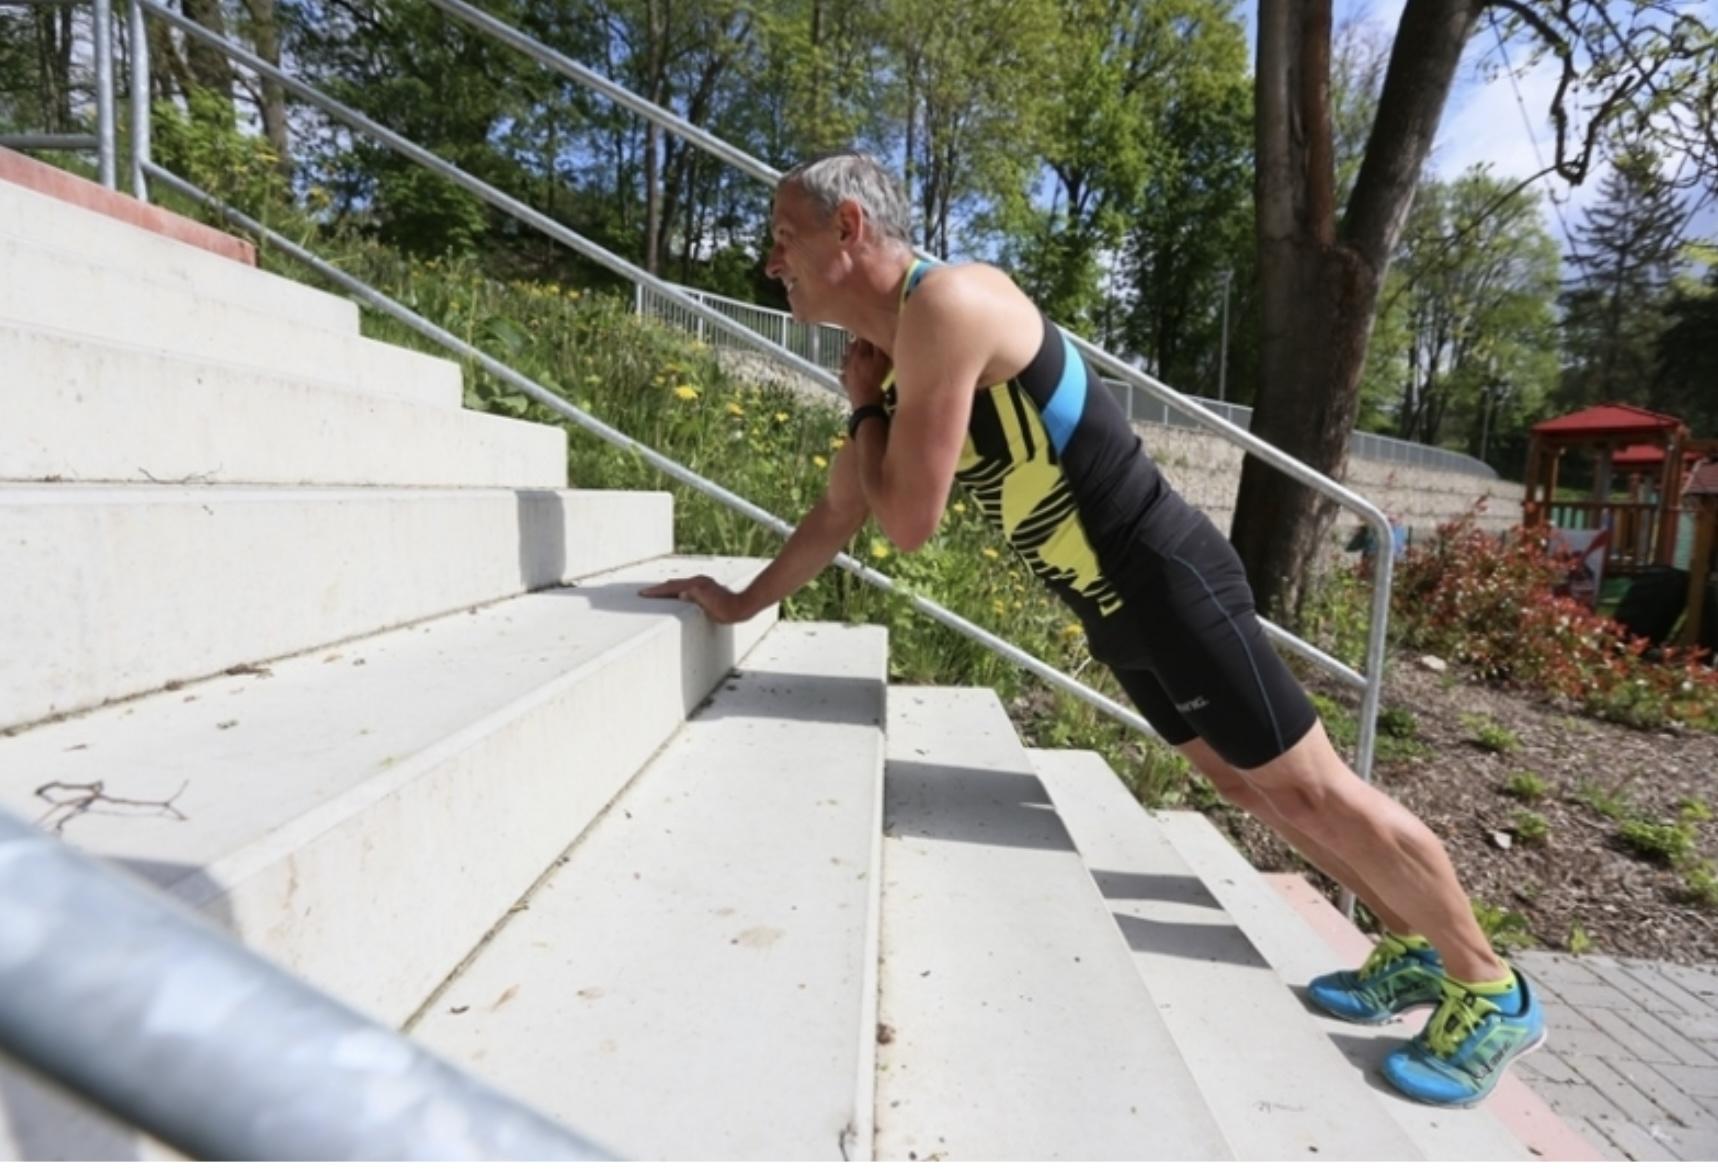 Schází ti kopce, běhej a cvič na schodech - prkno s rotací 1